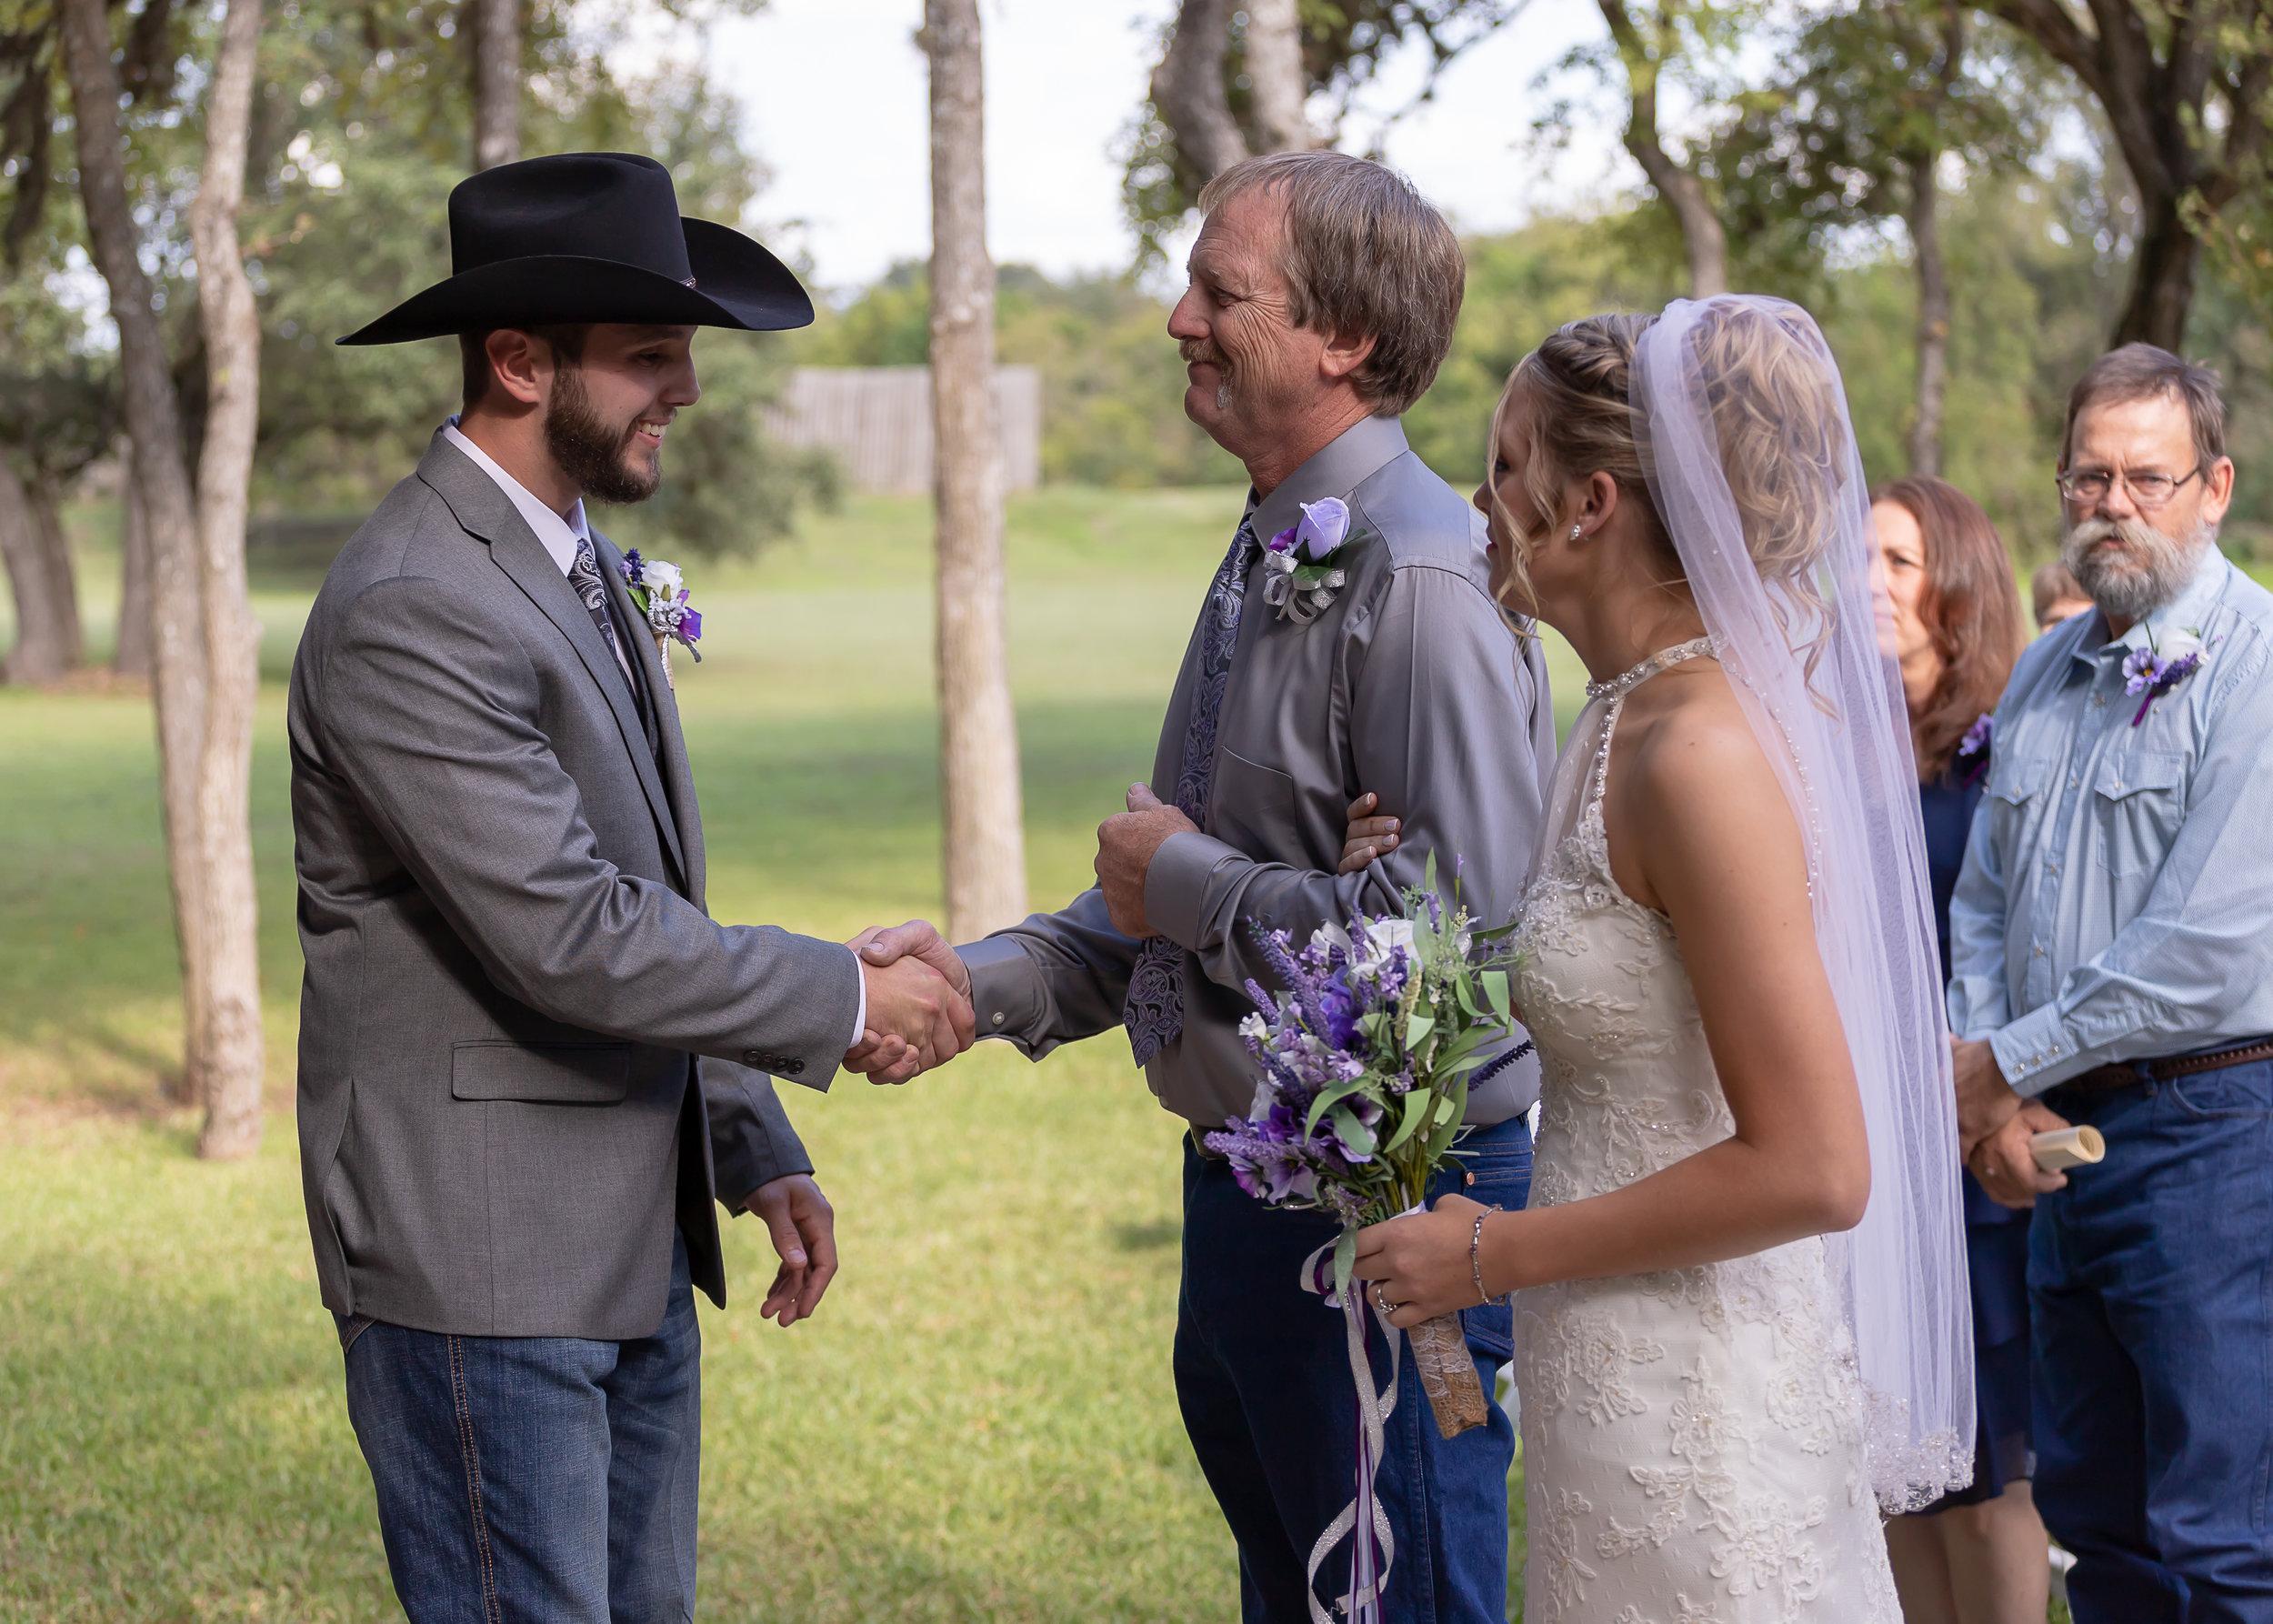 Hale Wedding shaking hands